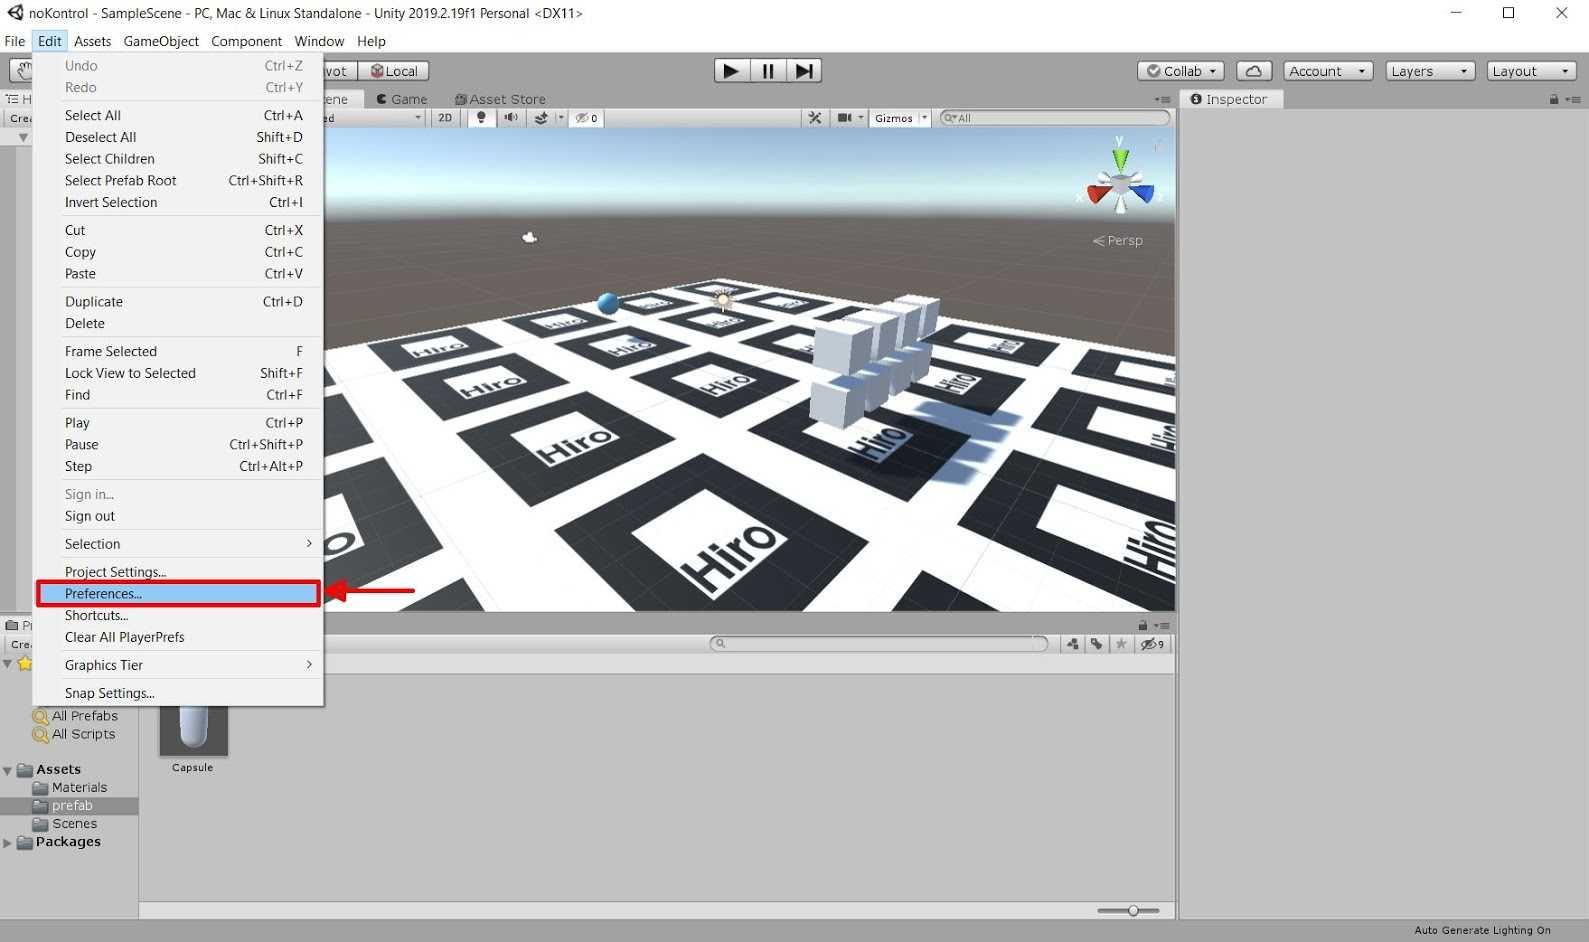 unity-kod-tamamlama-sorunu-visual-studio-1